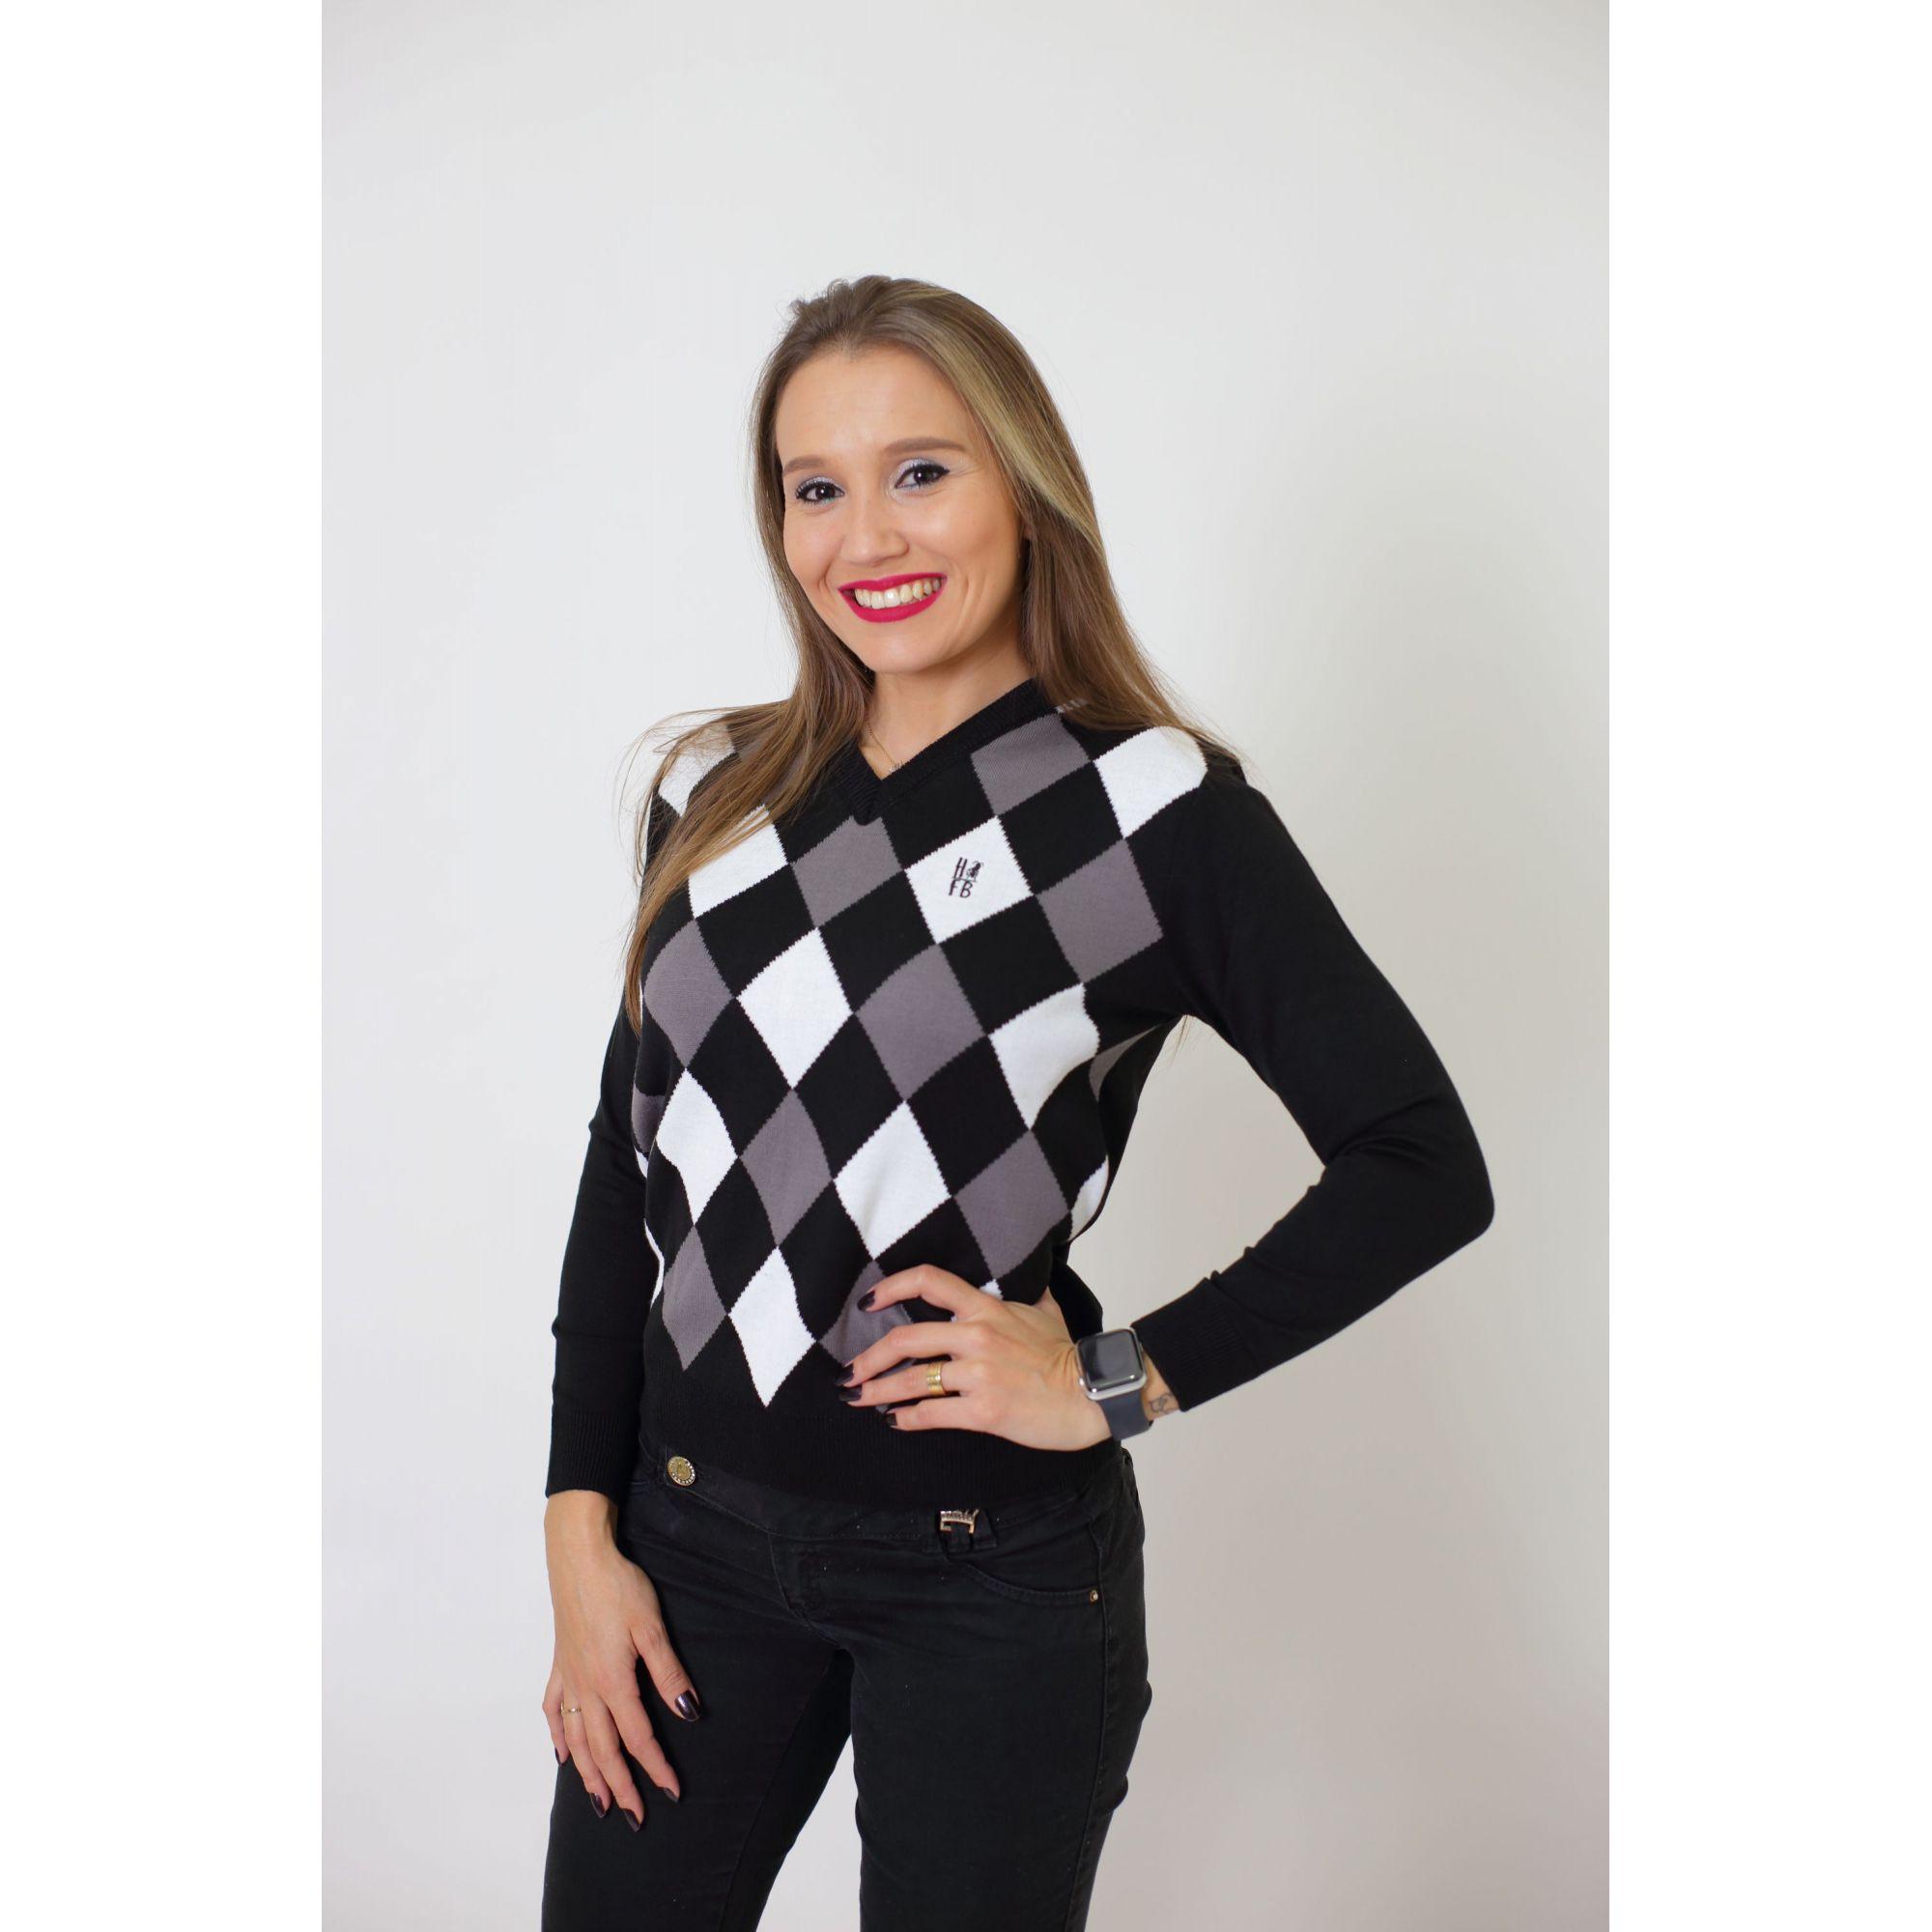 Blusa Suéter Jacquar Unissex Adulto  - Heitor Fashion Brazil